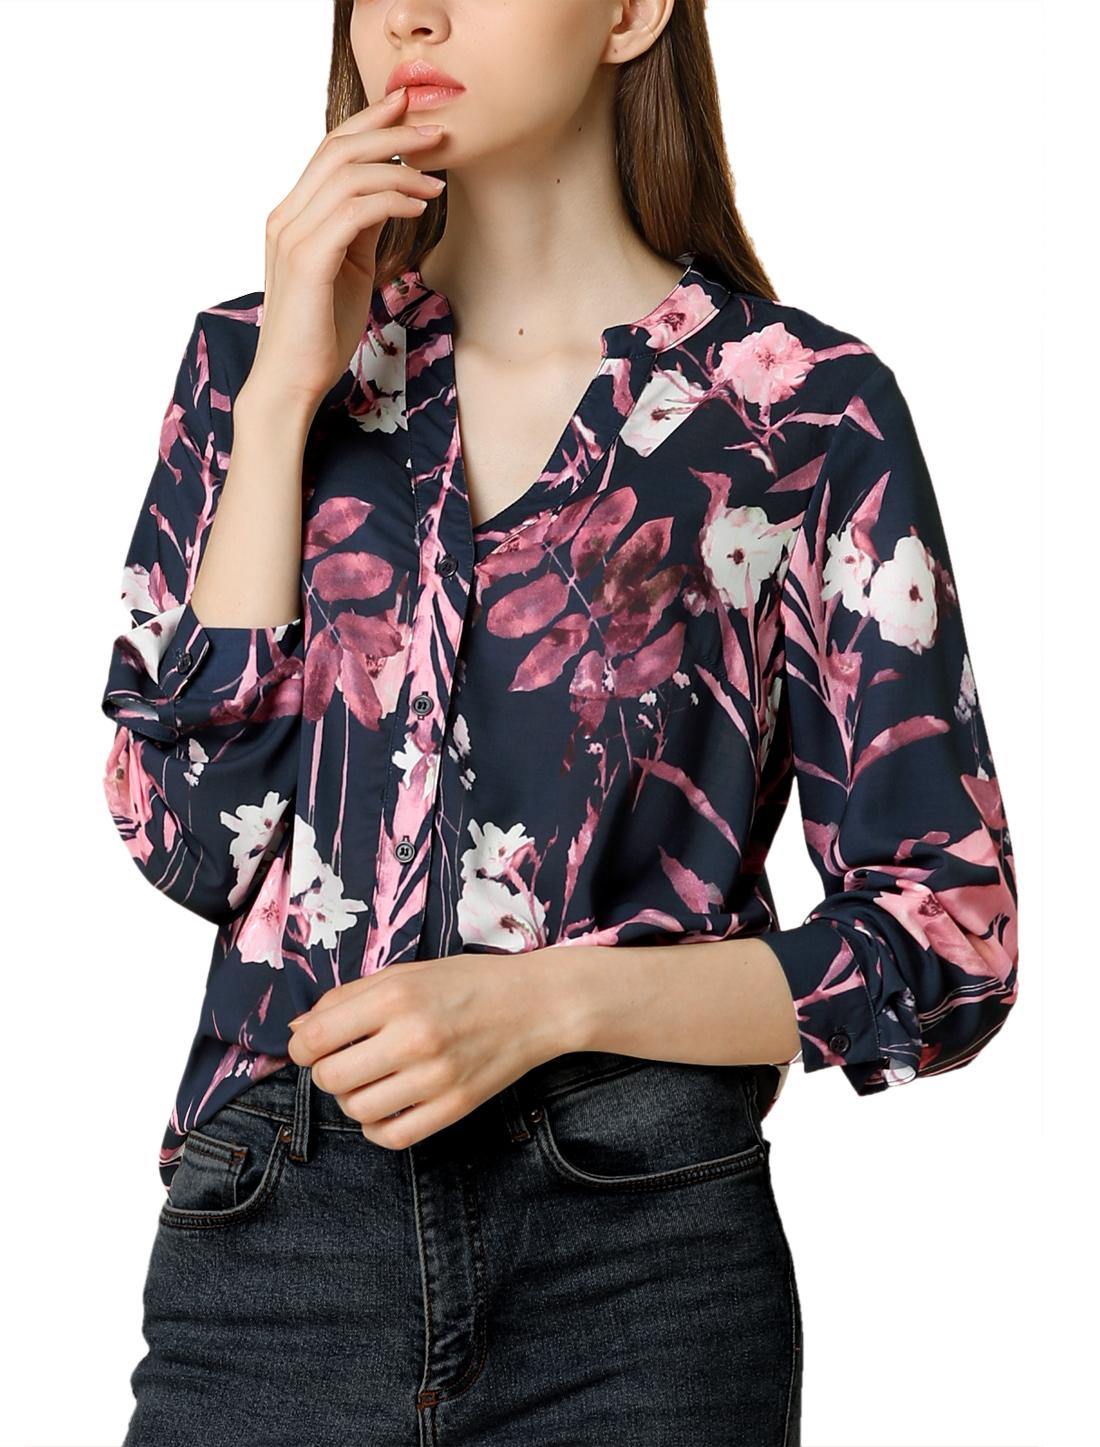 Allegra K Women's Button Down Stand Collar V Neck Floral Blouse Navy Blue M